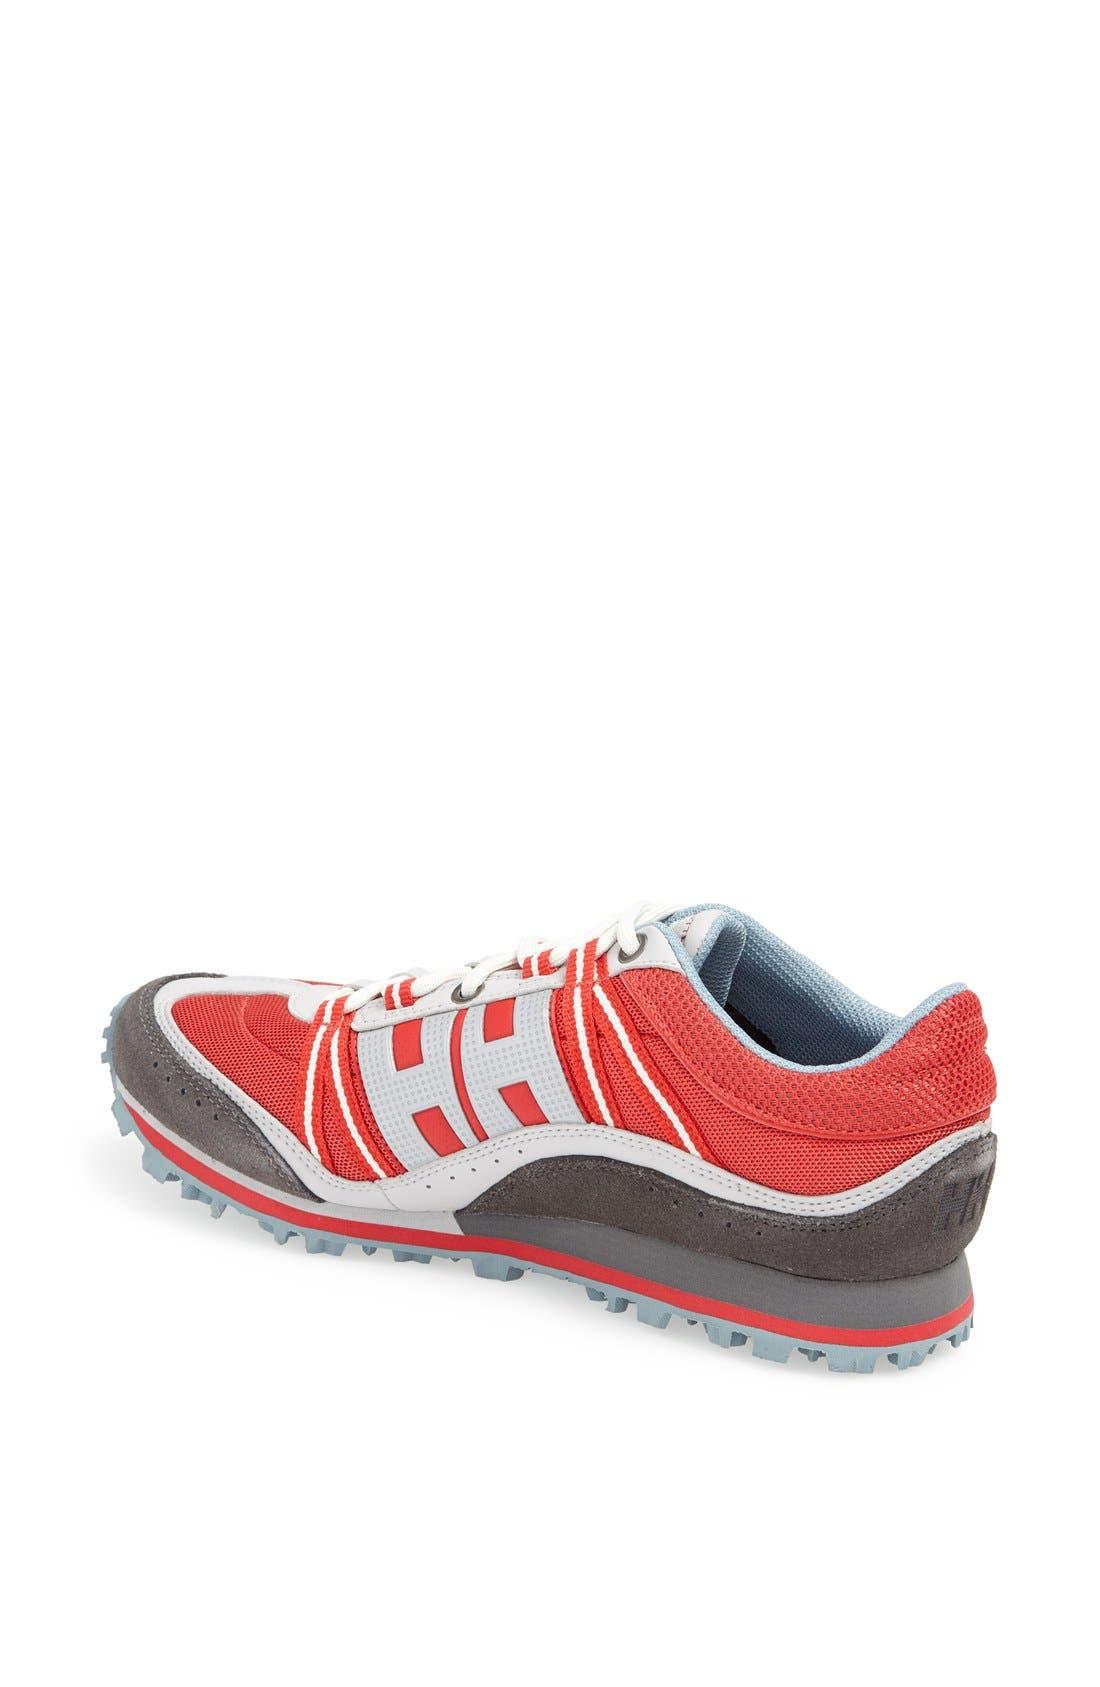 Alternate Image 2  - Helly Hansen 'Trail Cutter 5' Running Shoe (Women)